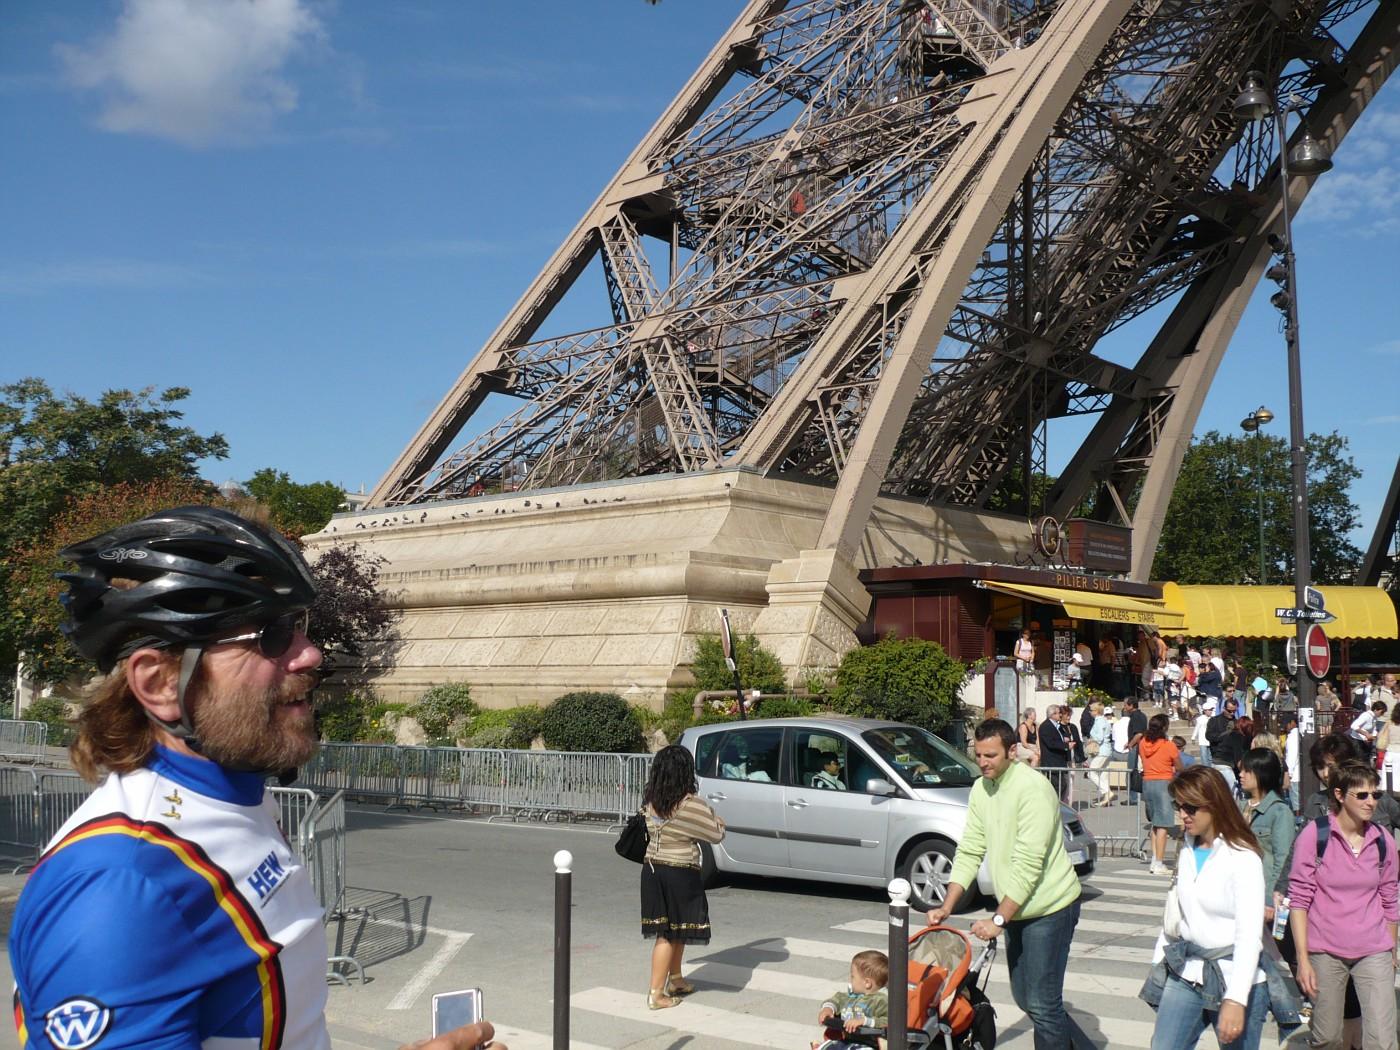 Manfred am Eiffelturm